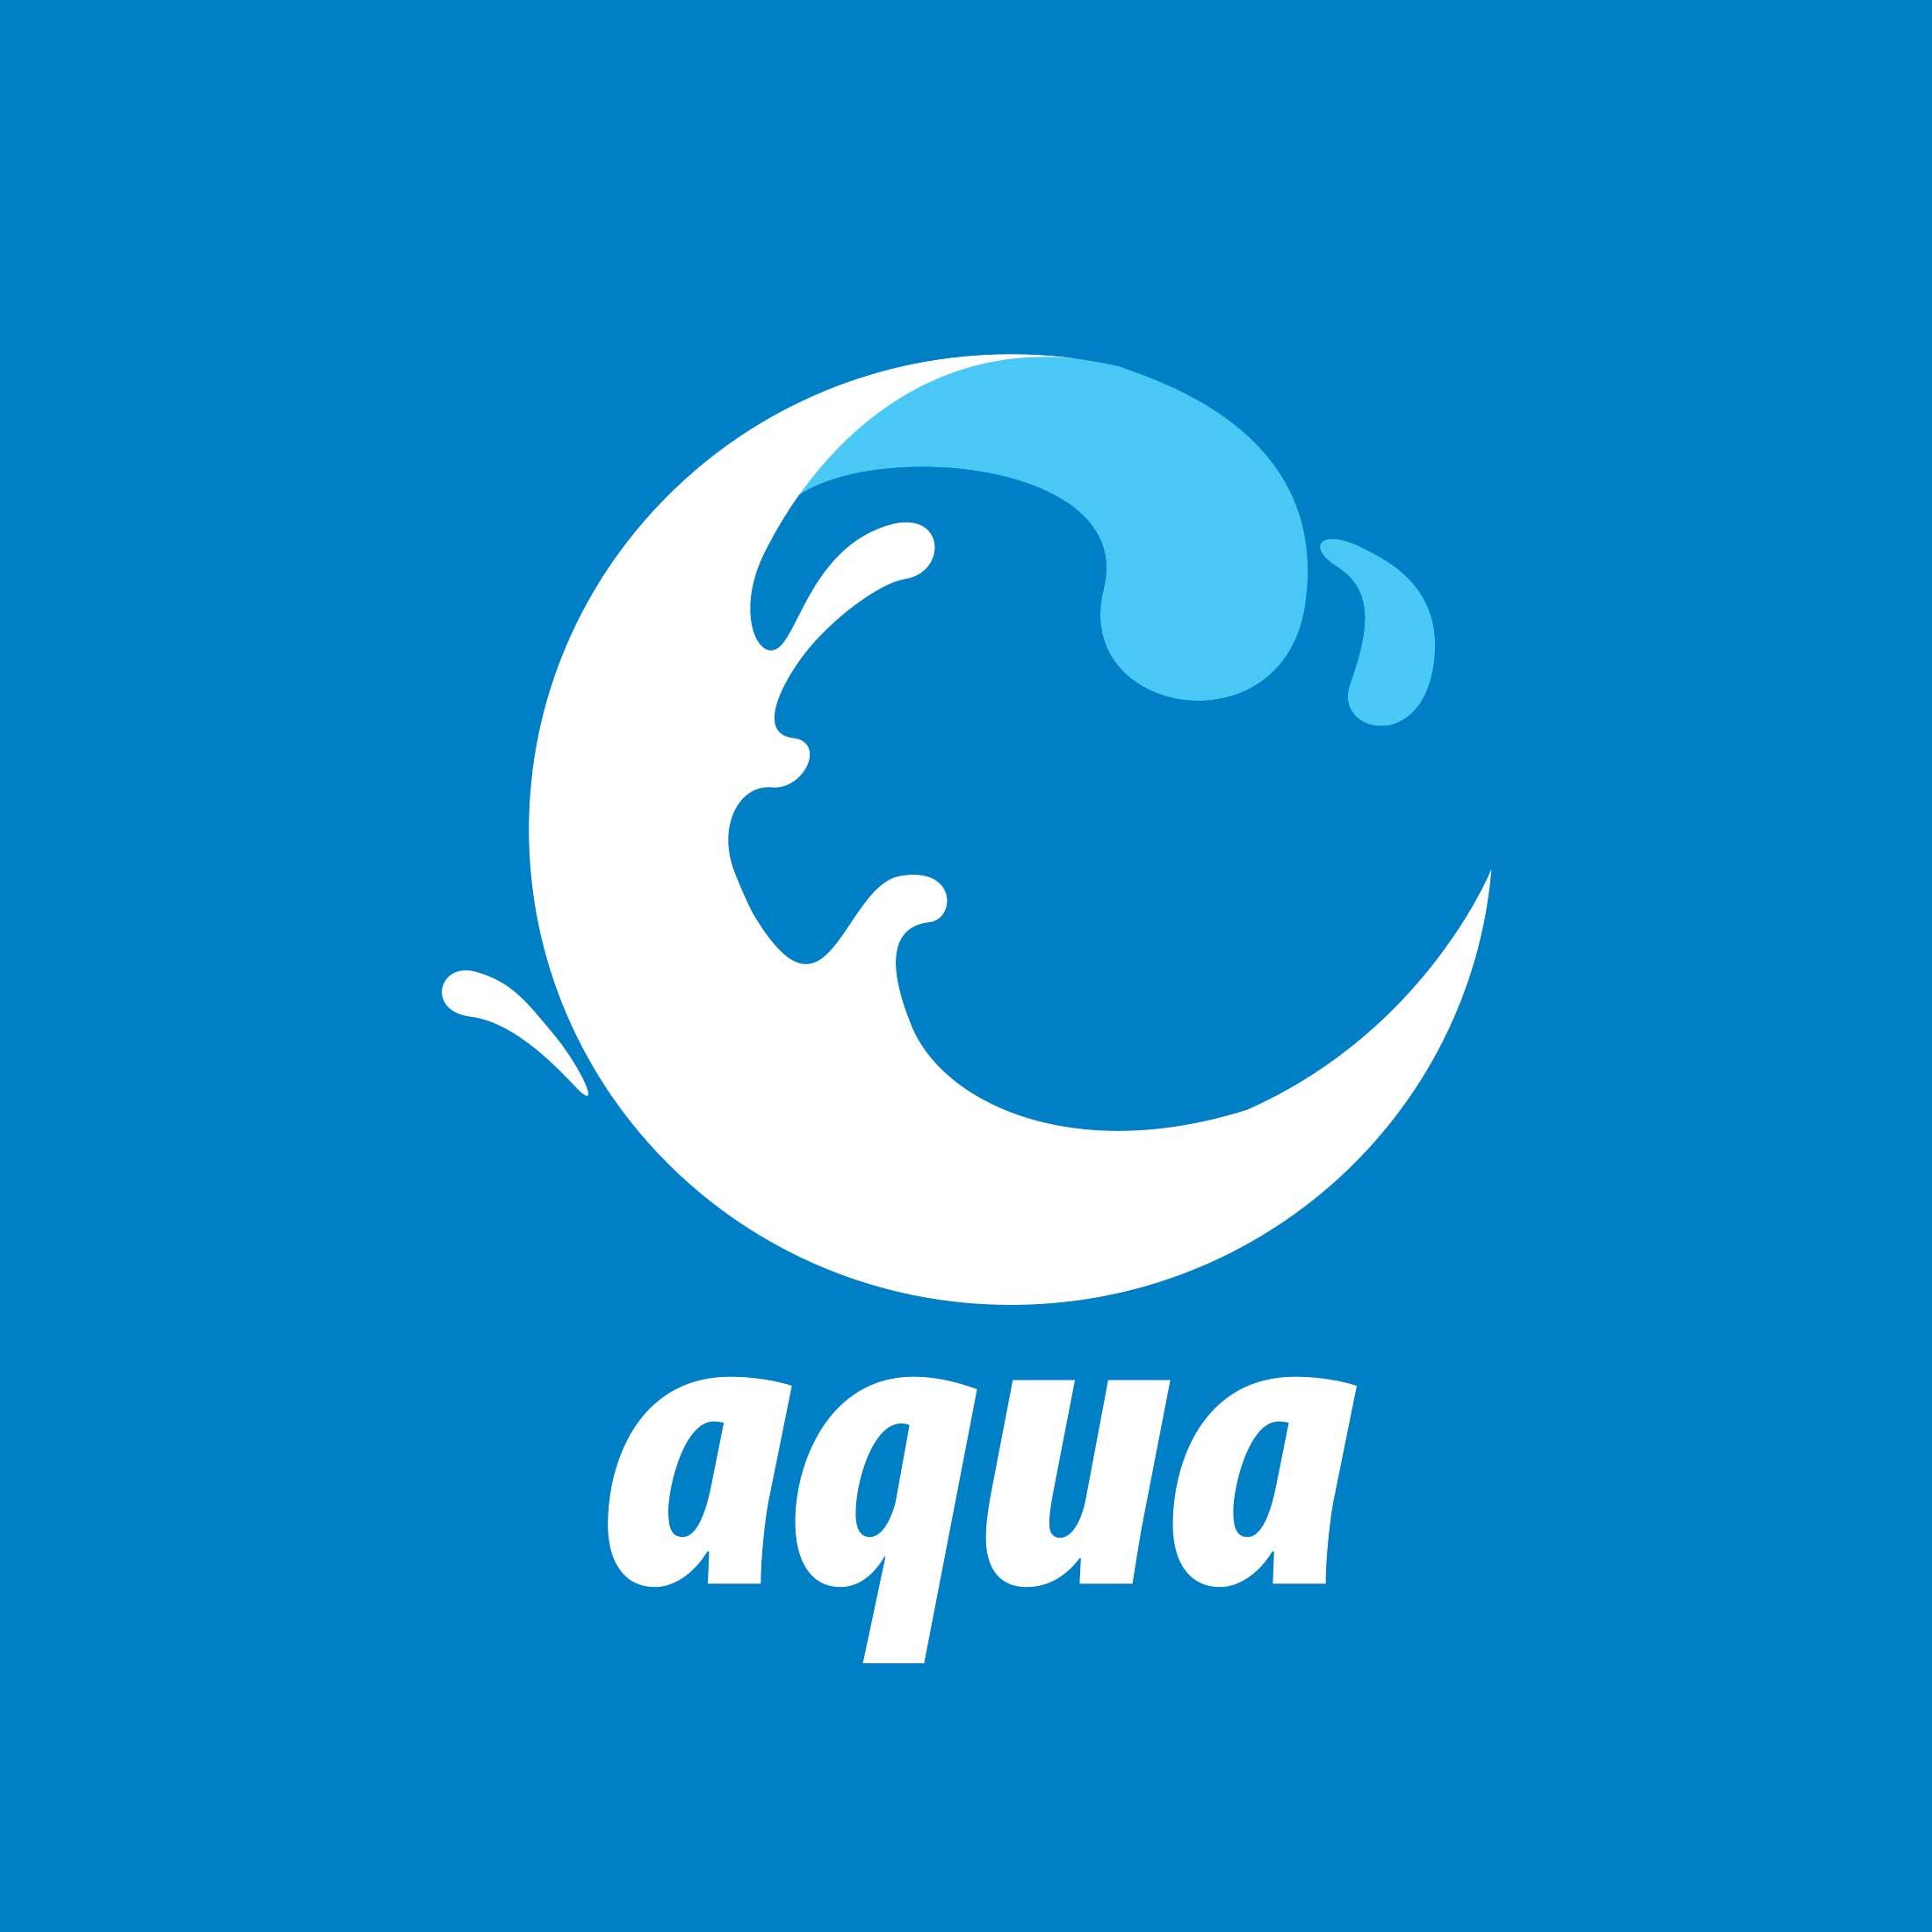 Free-water-logo-Vector-design